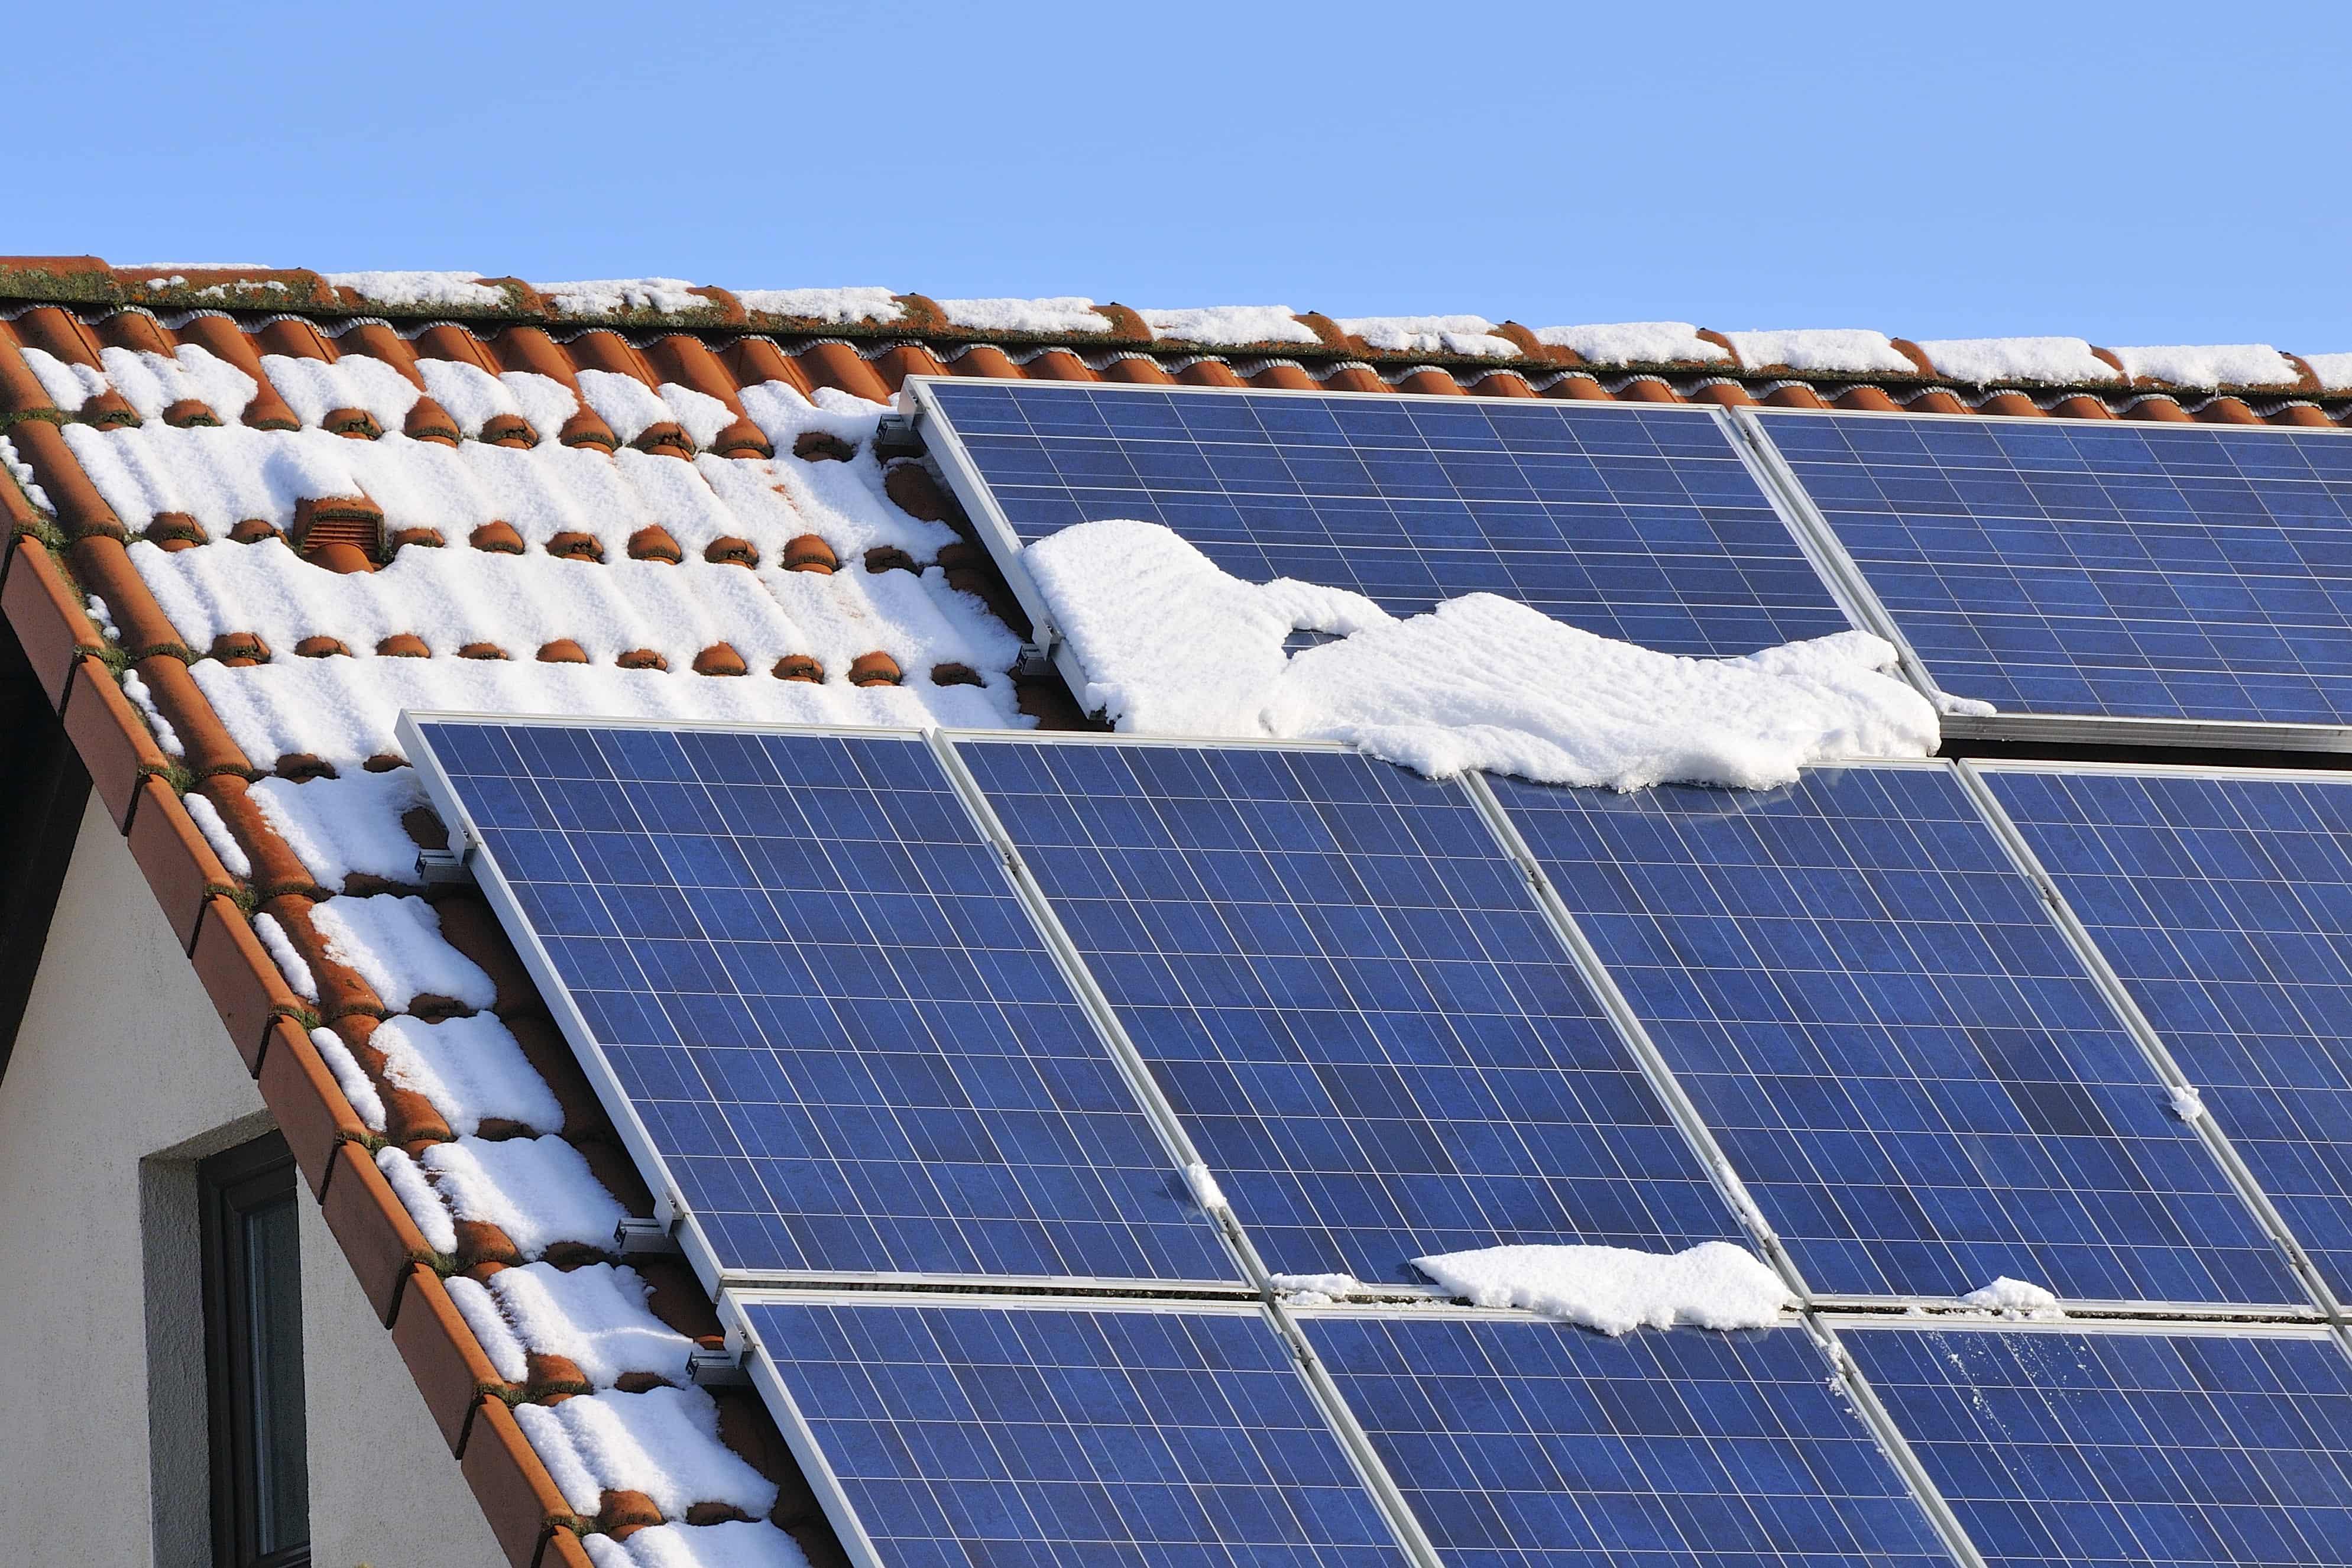 solar panels during winter